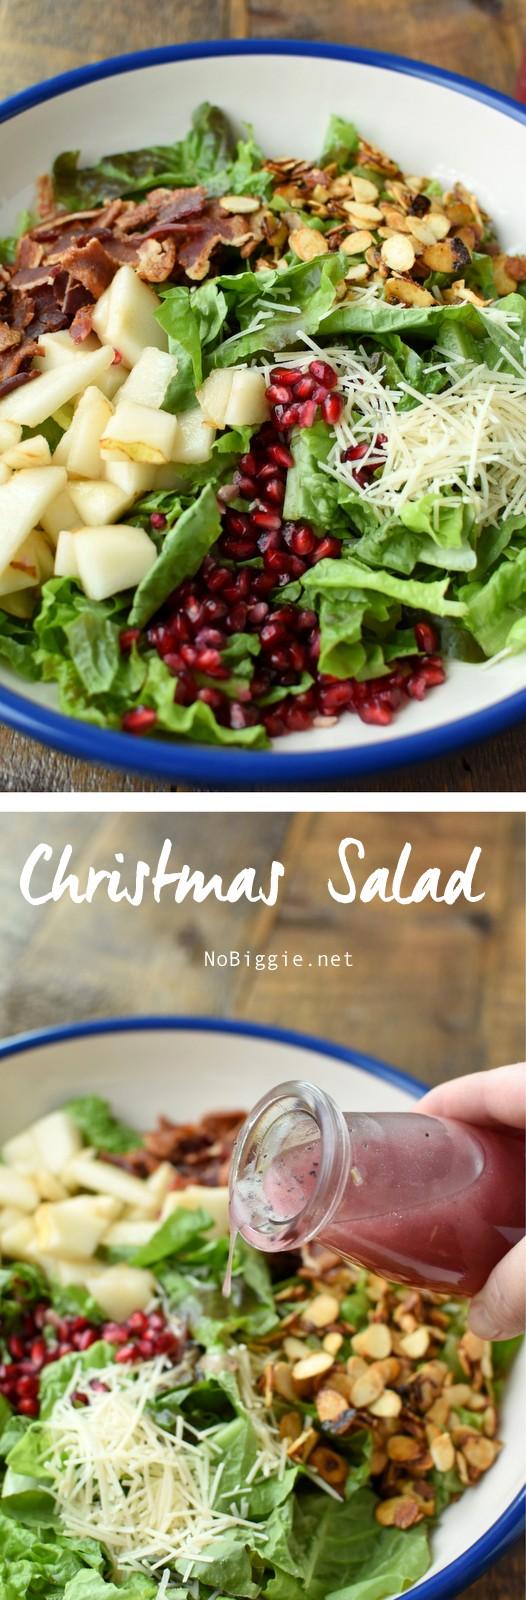 Christmas Salad | NoBiggie.net